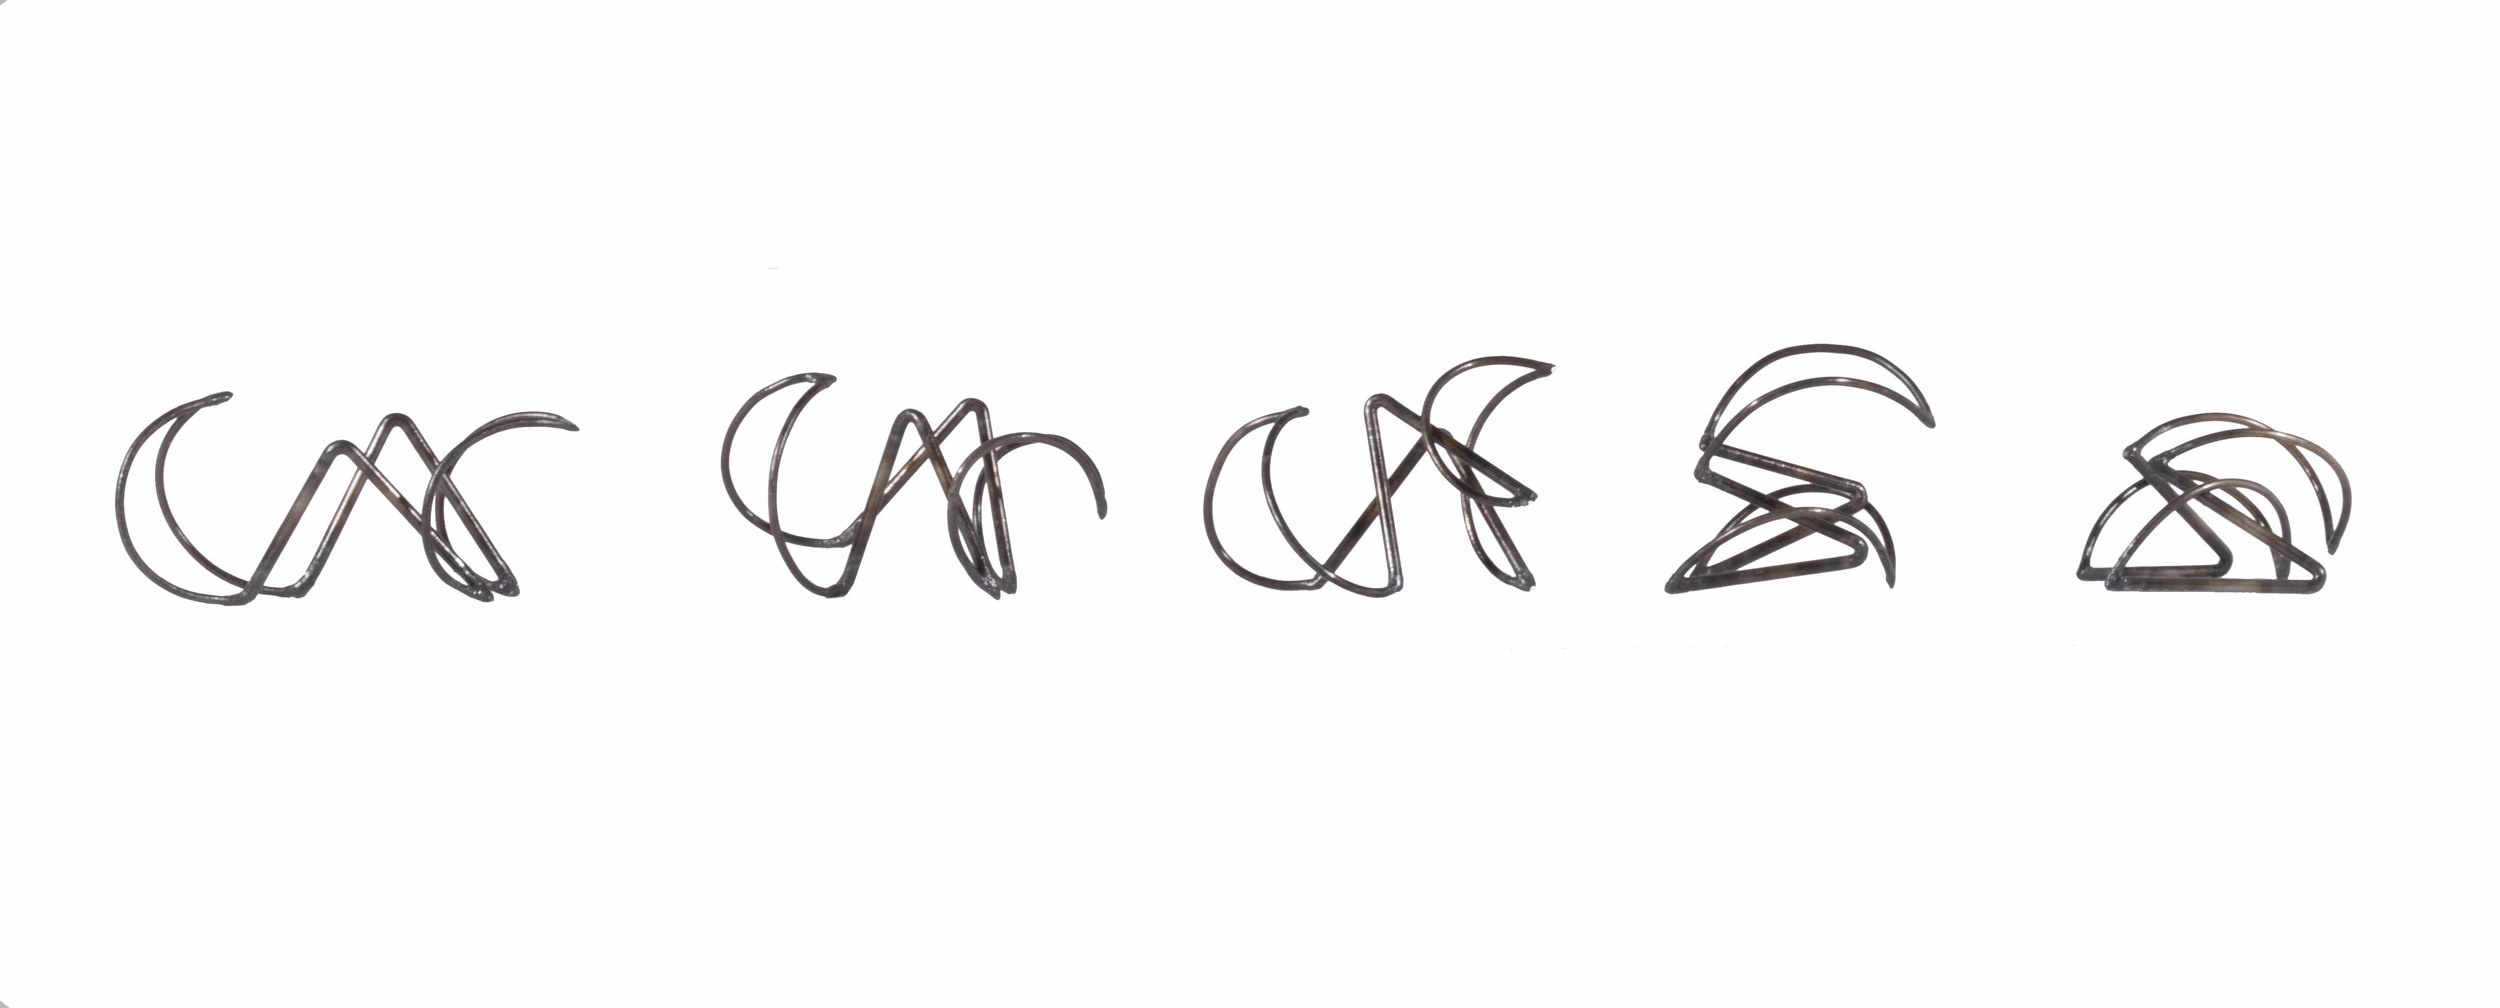 Colligraphic Progression 1992